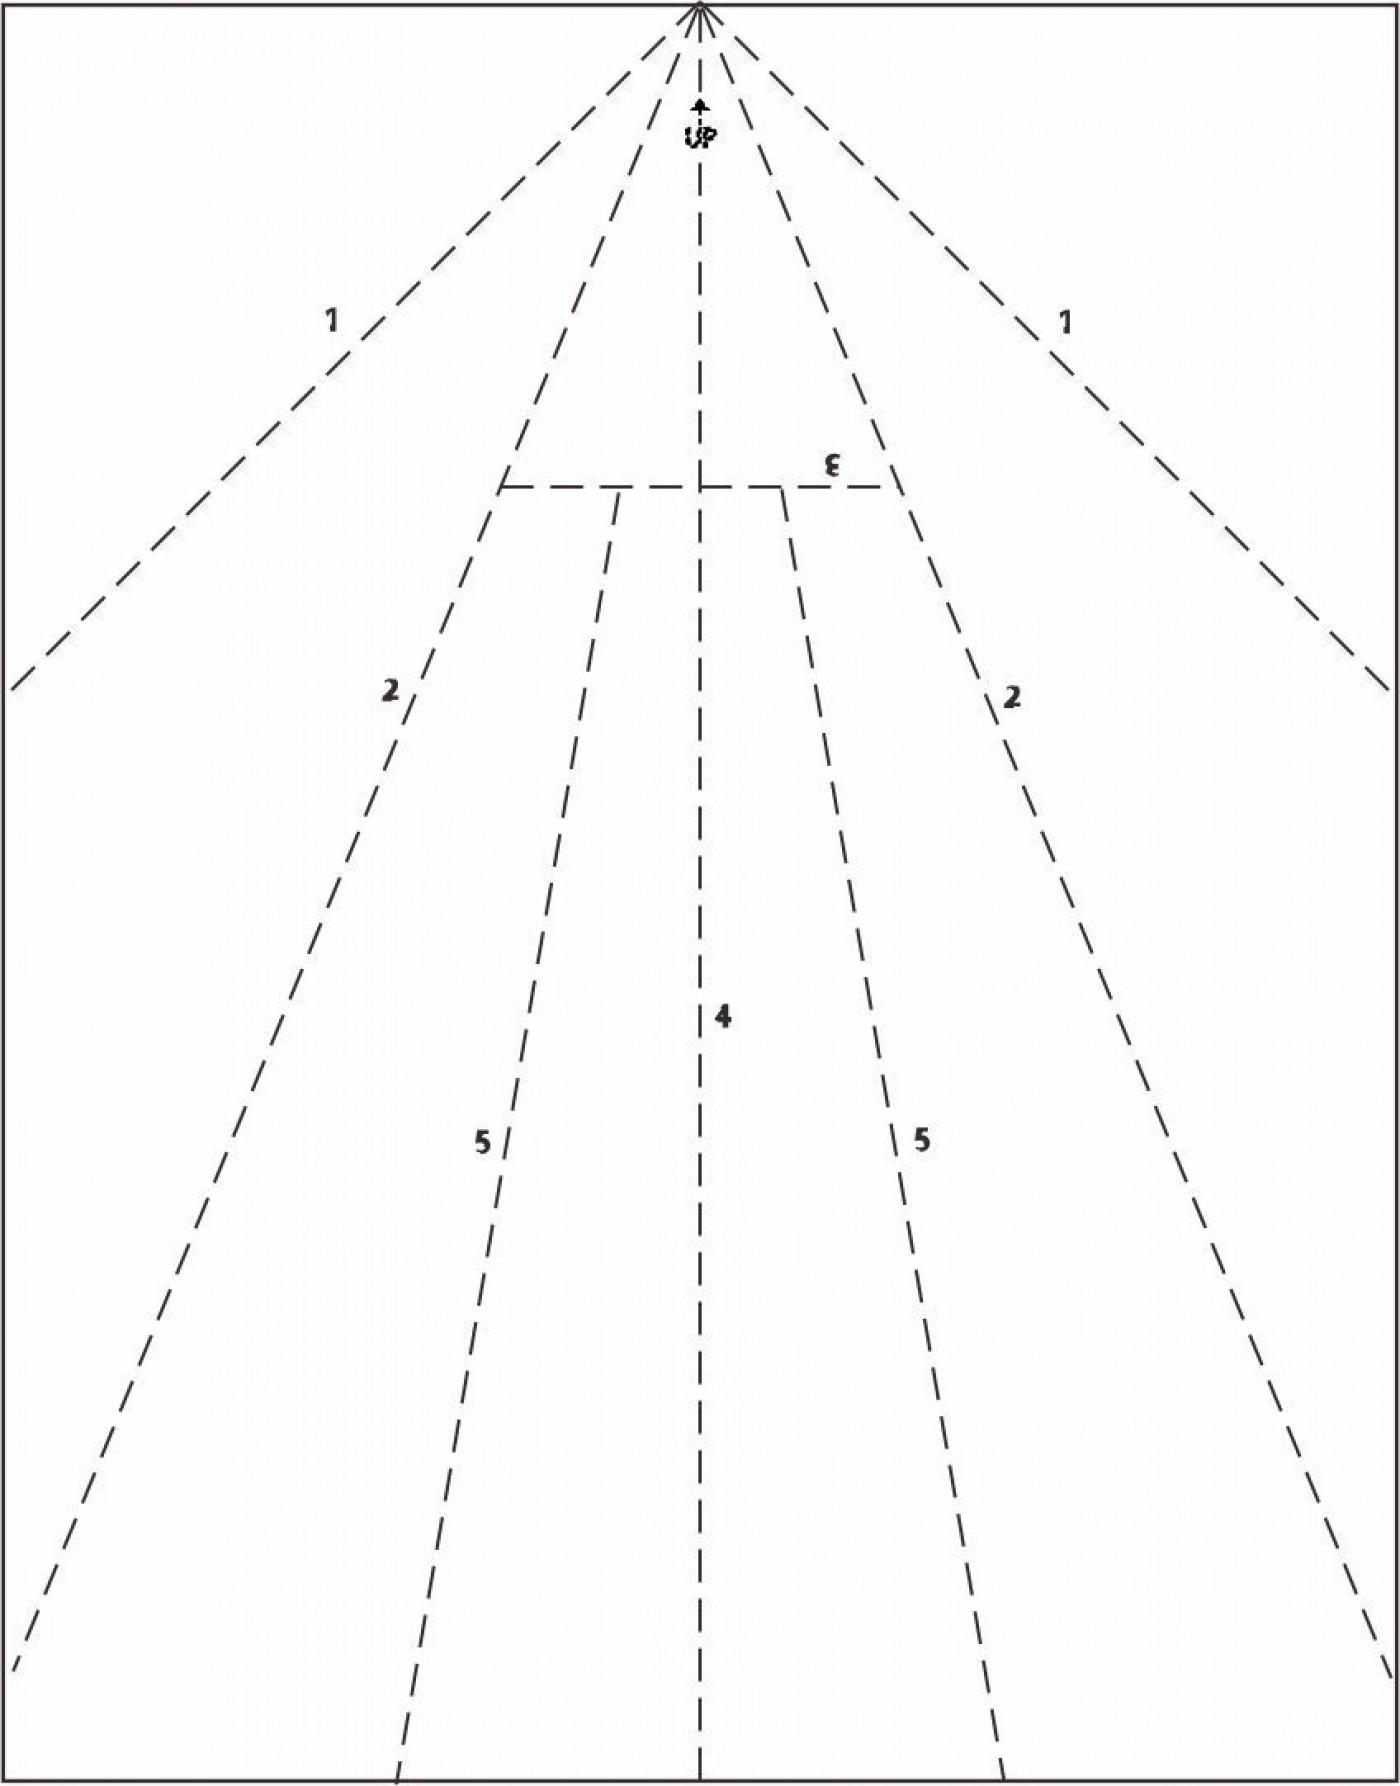 009 Surprising Printable Paper Airplane Pattern Example  Free Plane Design Designs-printable Template1400